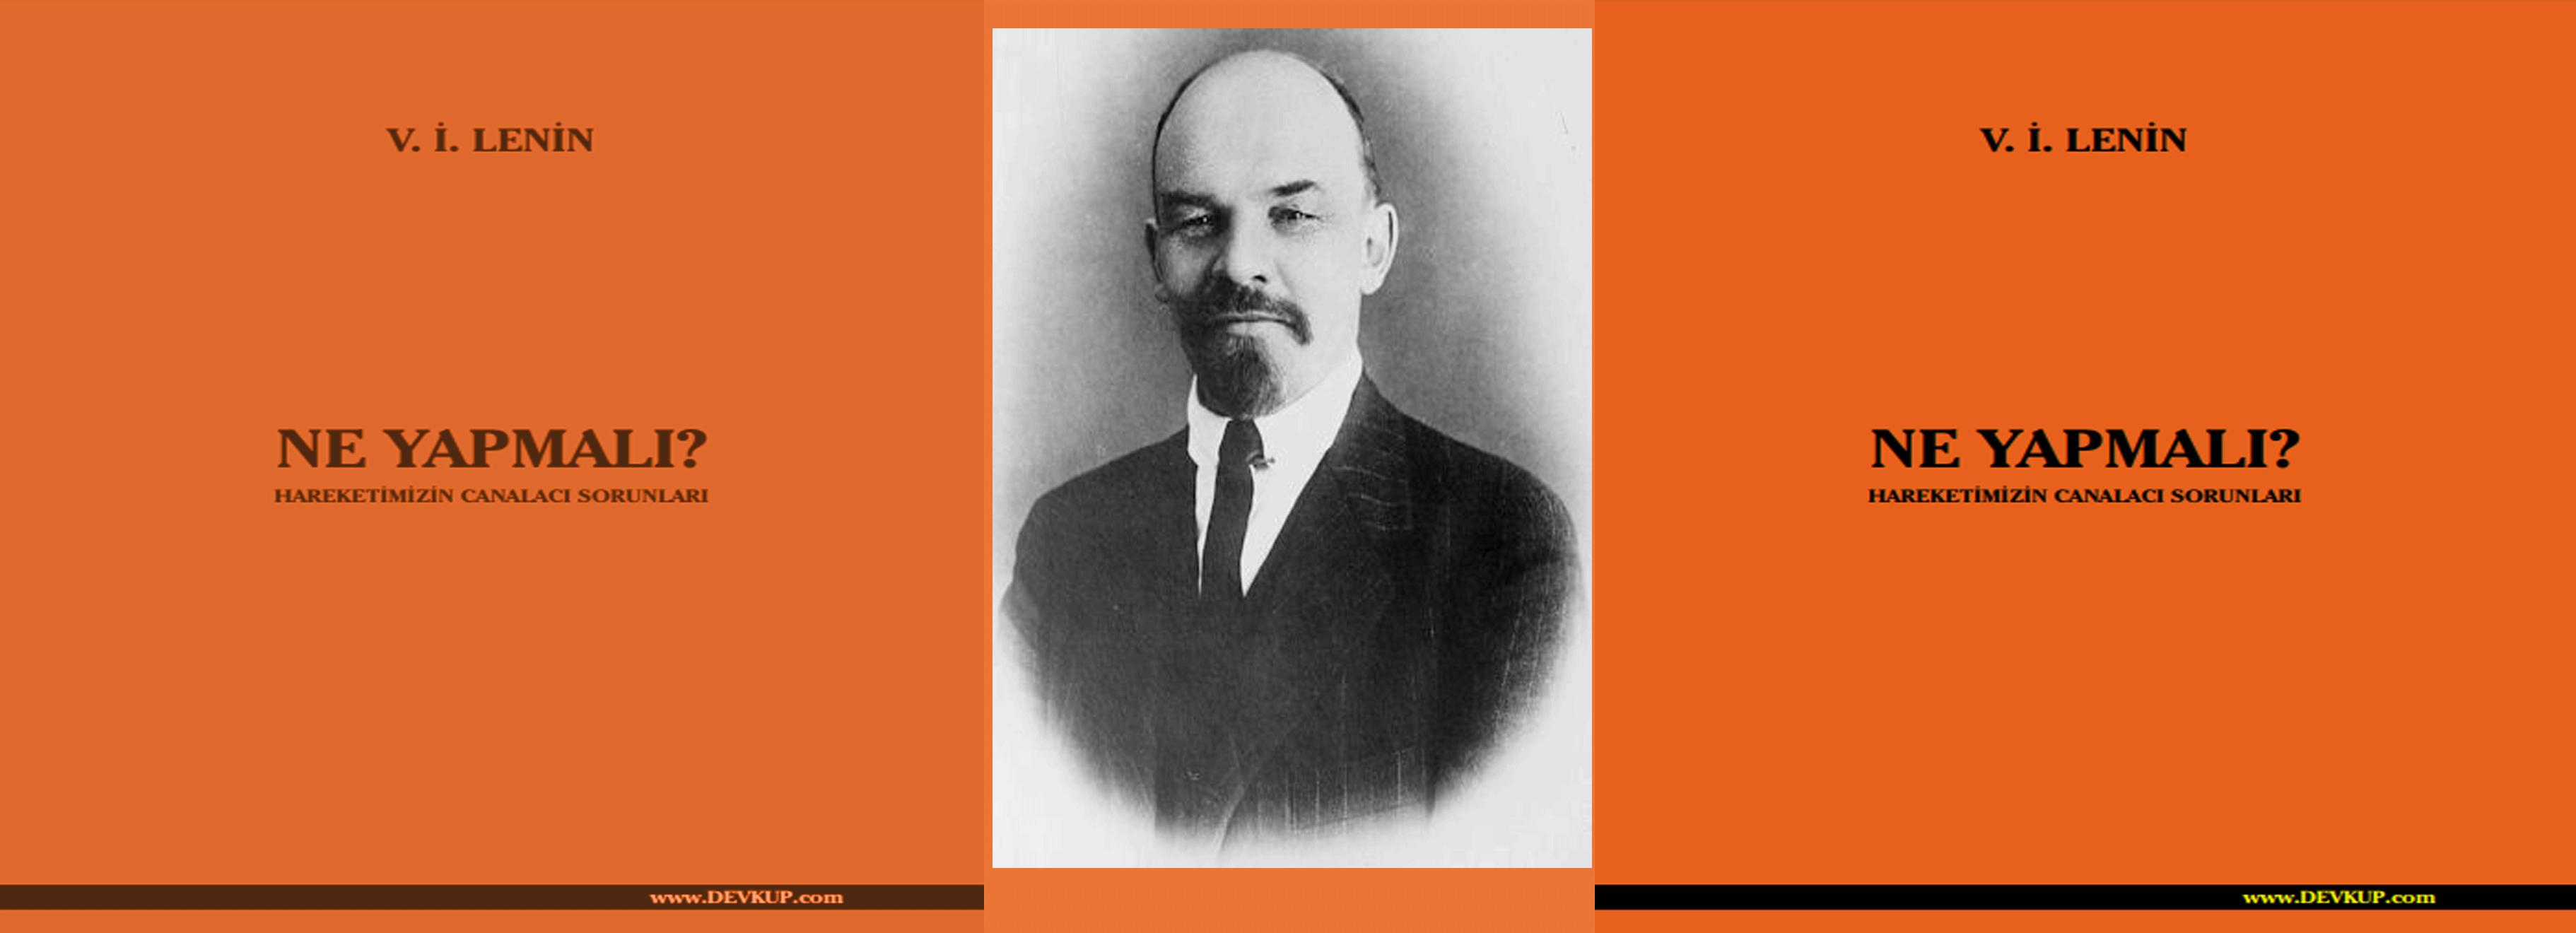 Ne Yapmali Lenin Wwwdevkupcom Pinterest